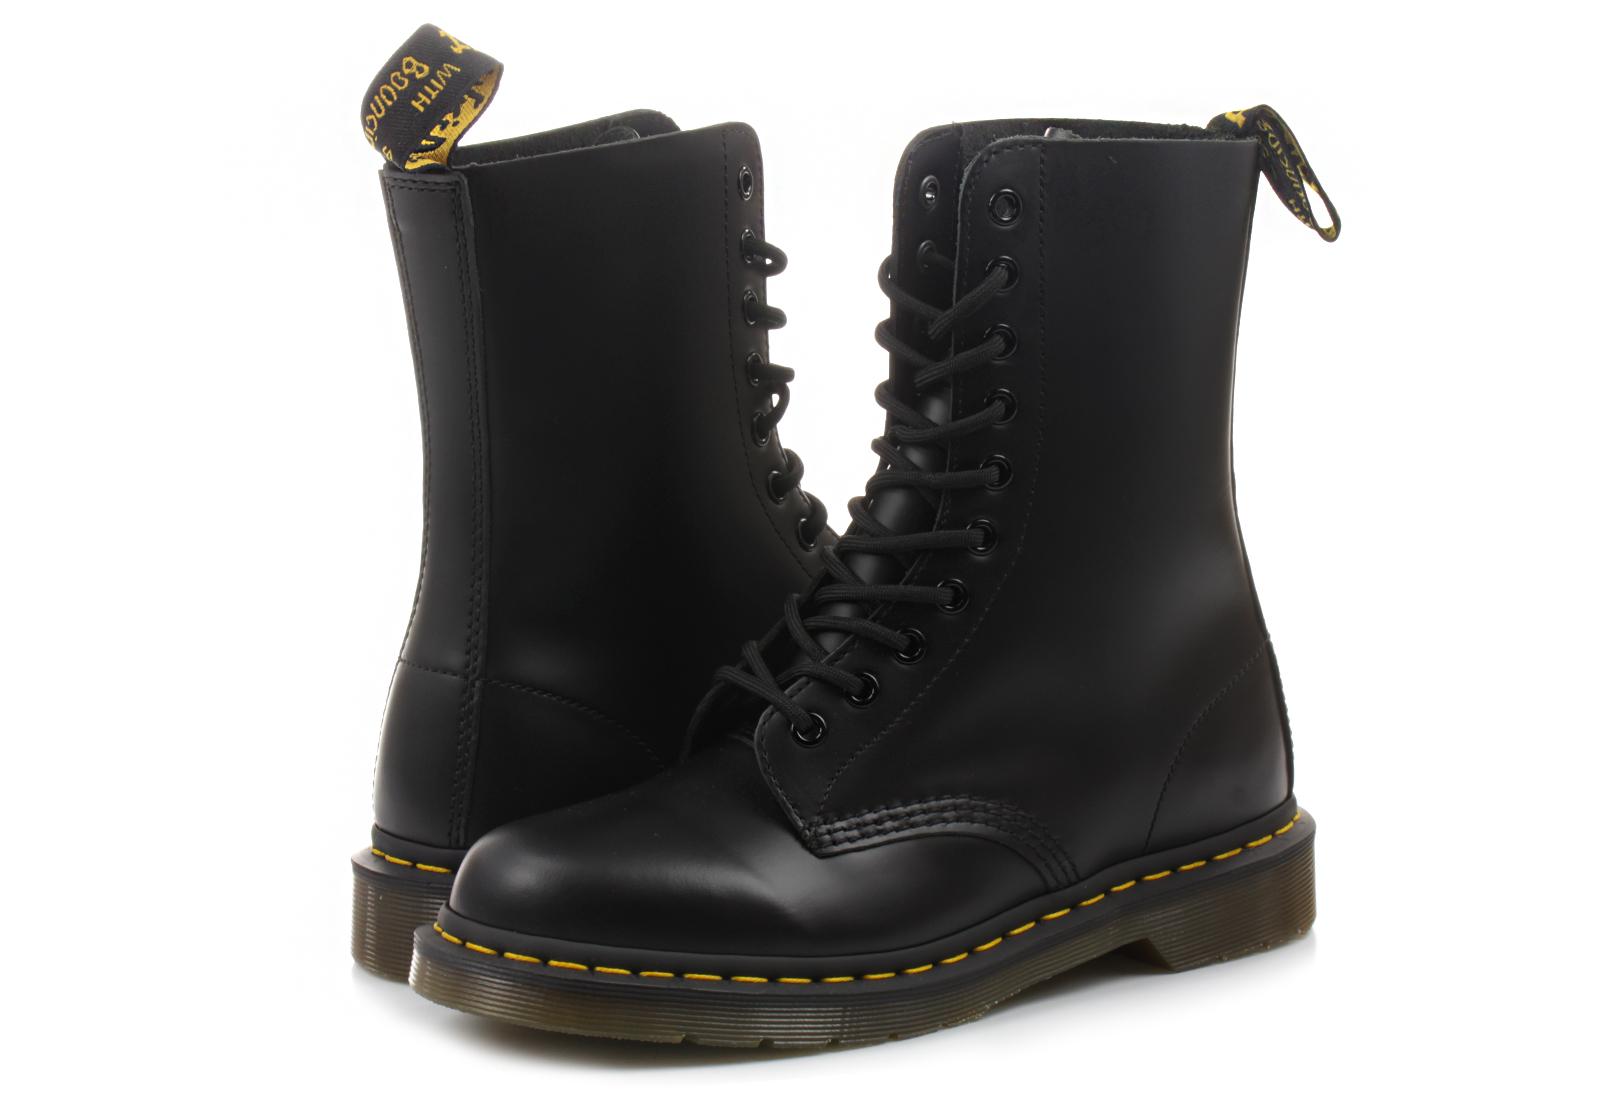 5112d02caf Dr Martens Bakancs - 1490 - 10 Eye Boot - DM10092001 - Office Shoes ...